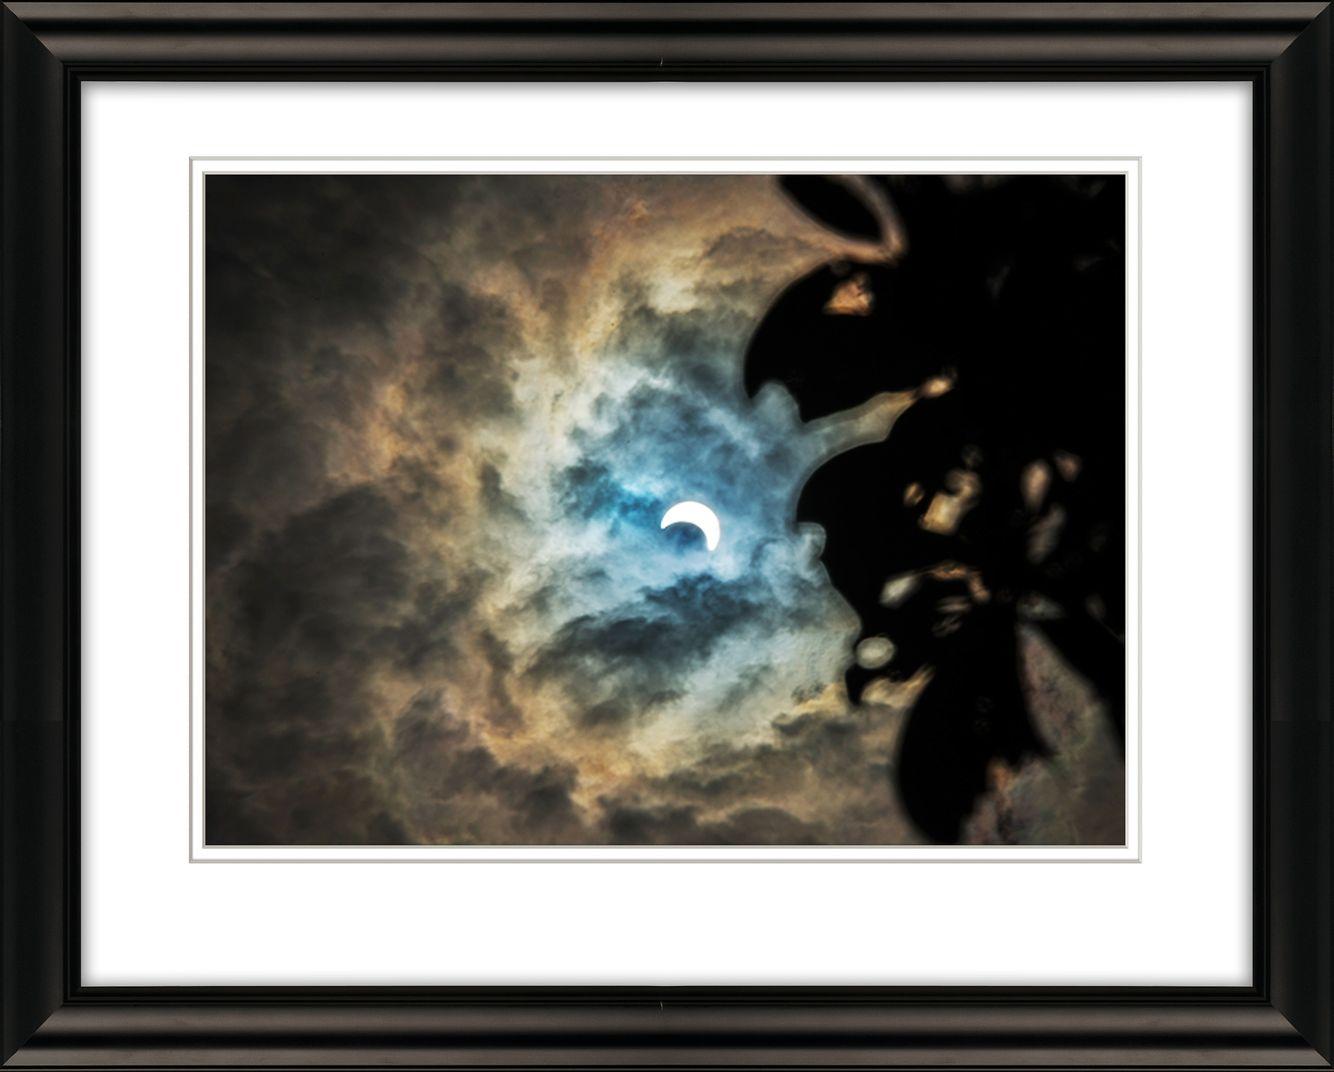 Frame-7725-Solar-Eclipse-livebooks-.jpg